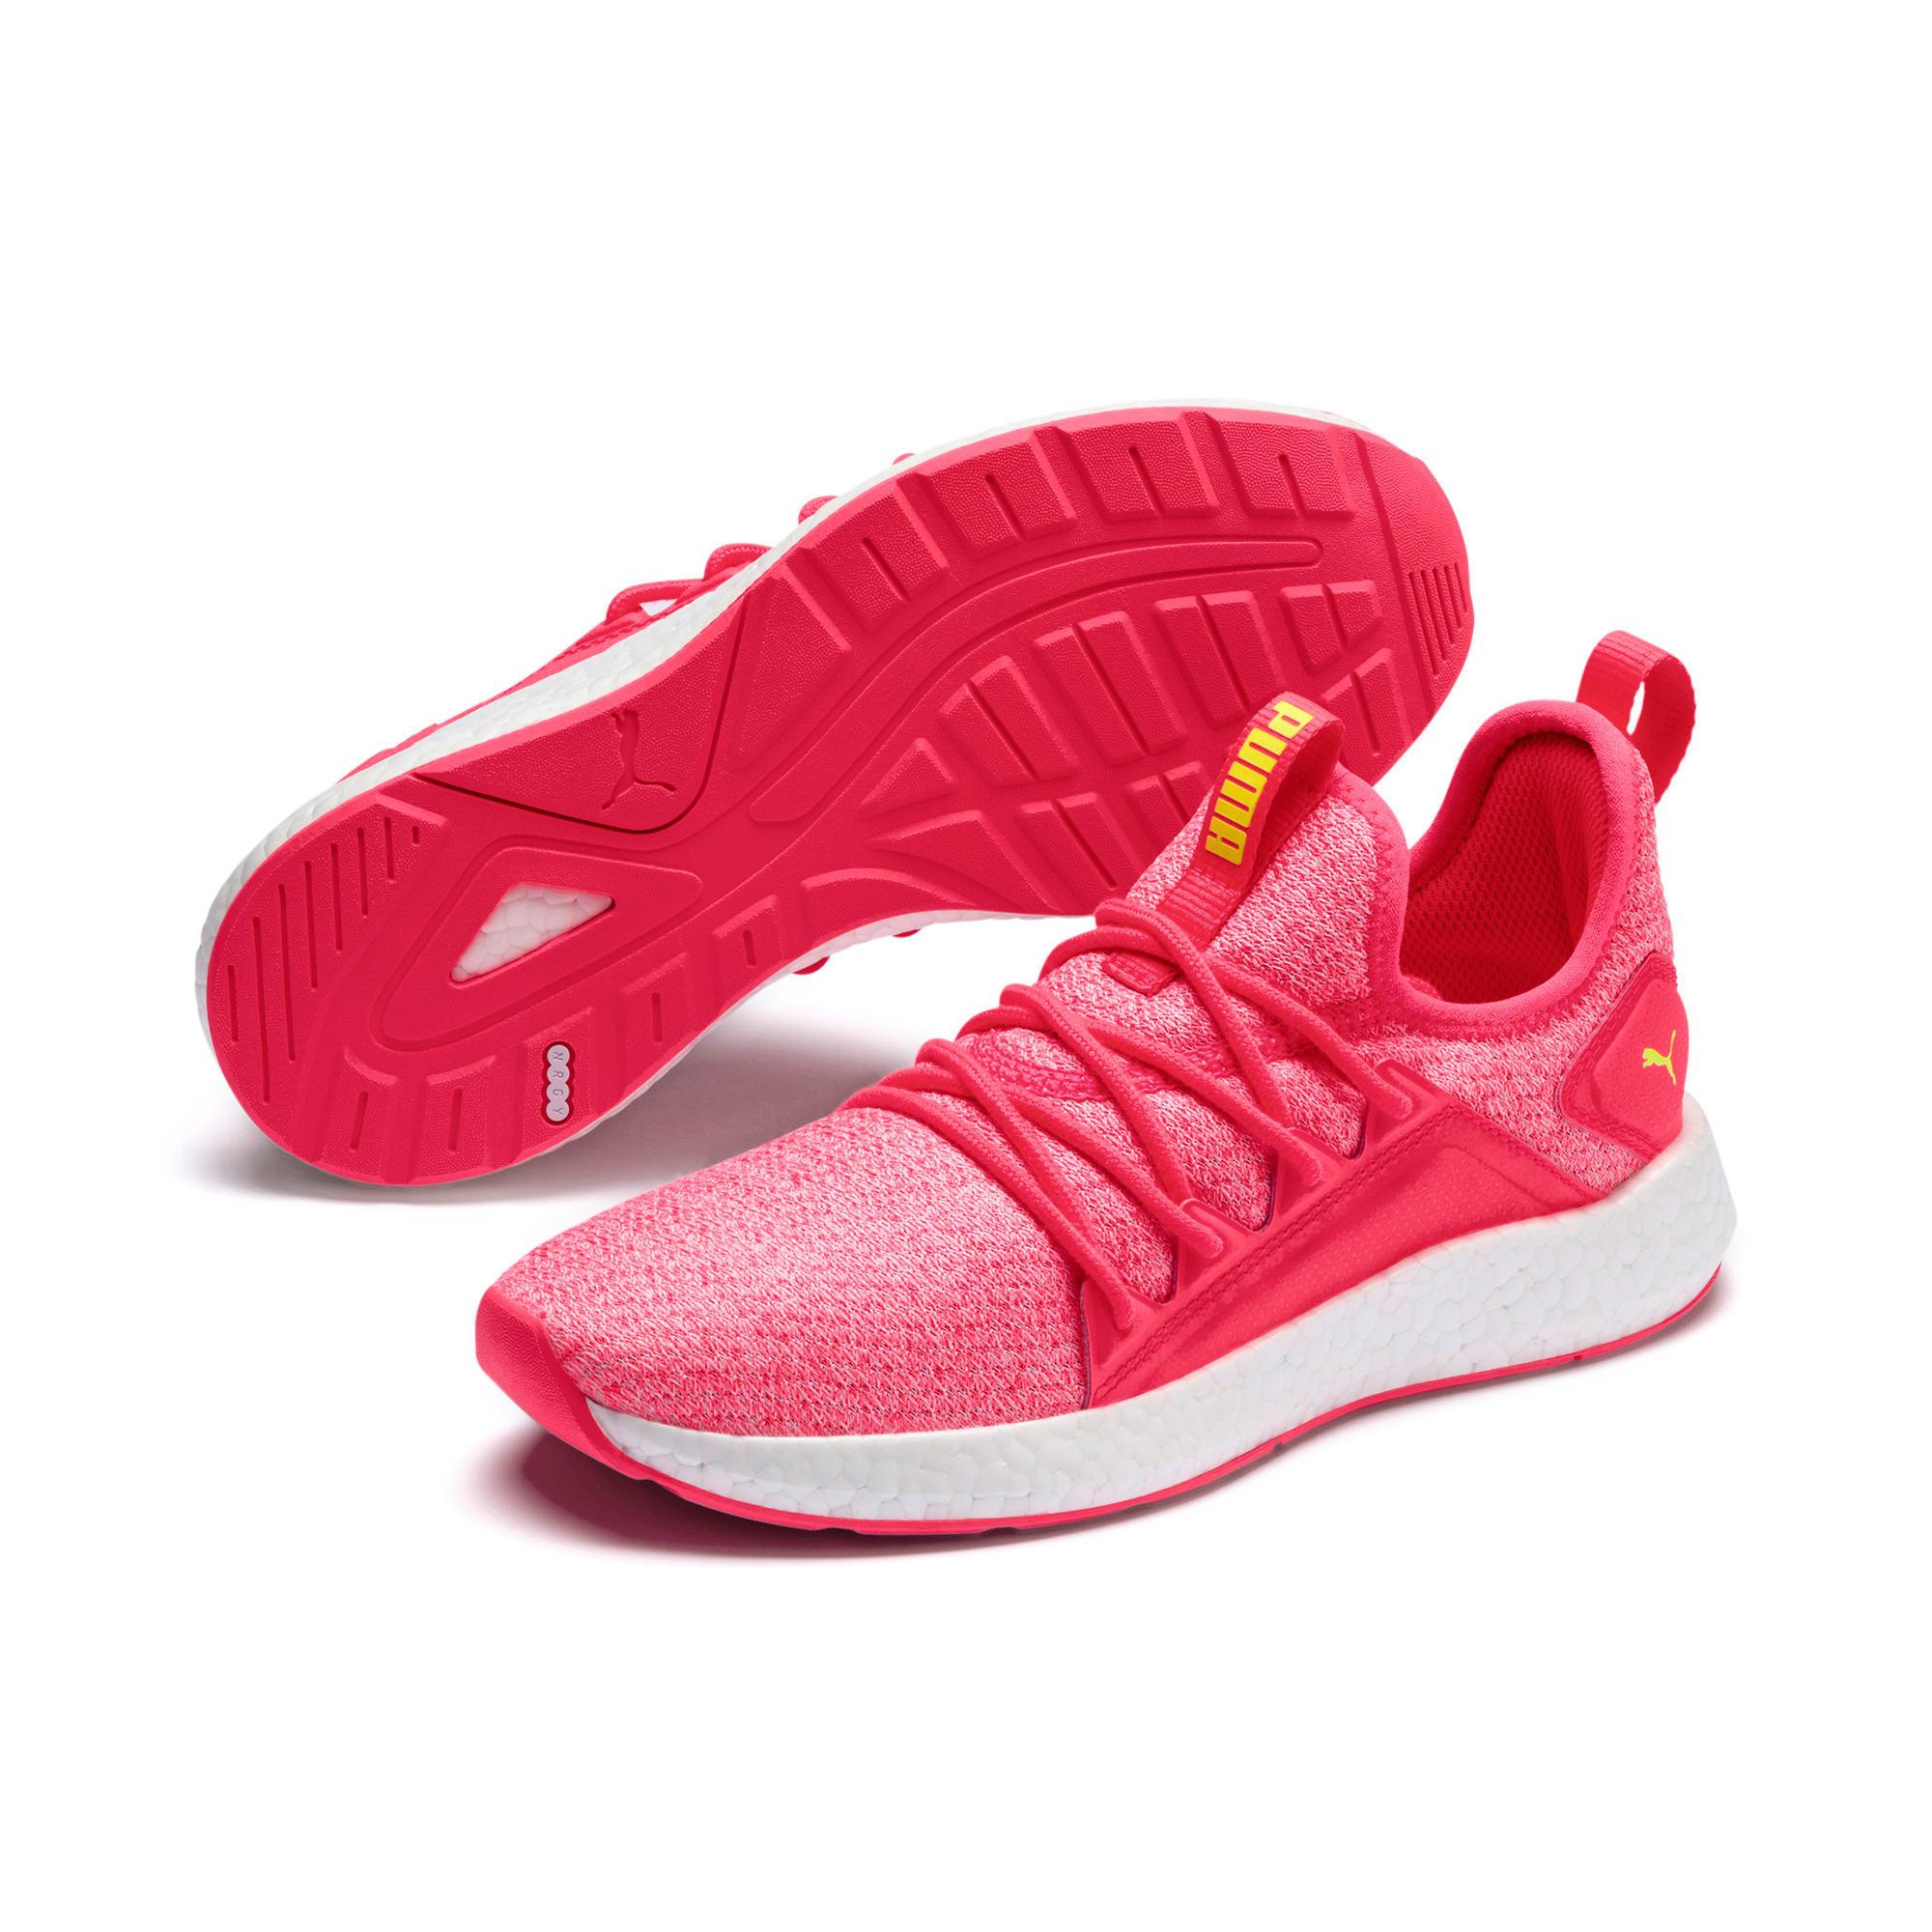 Thumbnail 3 of NRGY Neko Knit Women's Running Shoes, Pink Alert-Puma White, medium